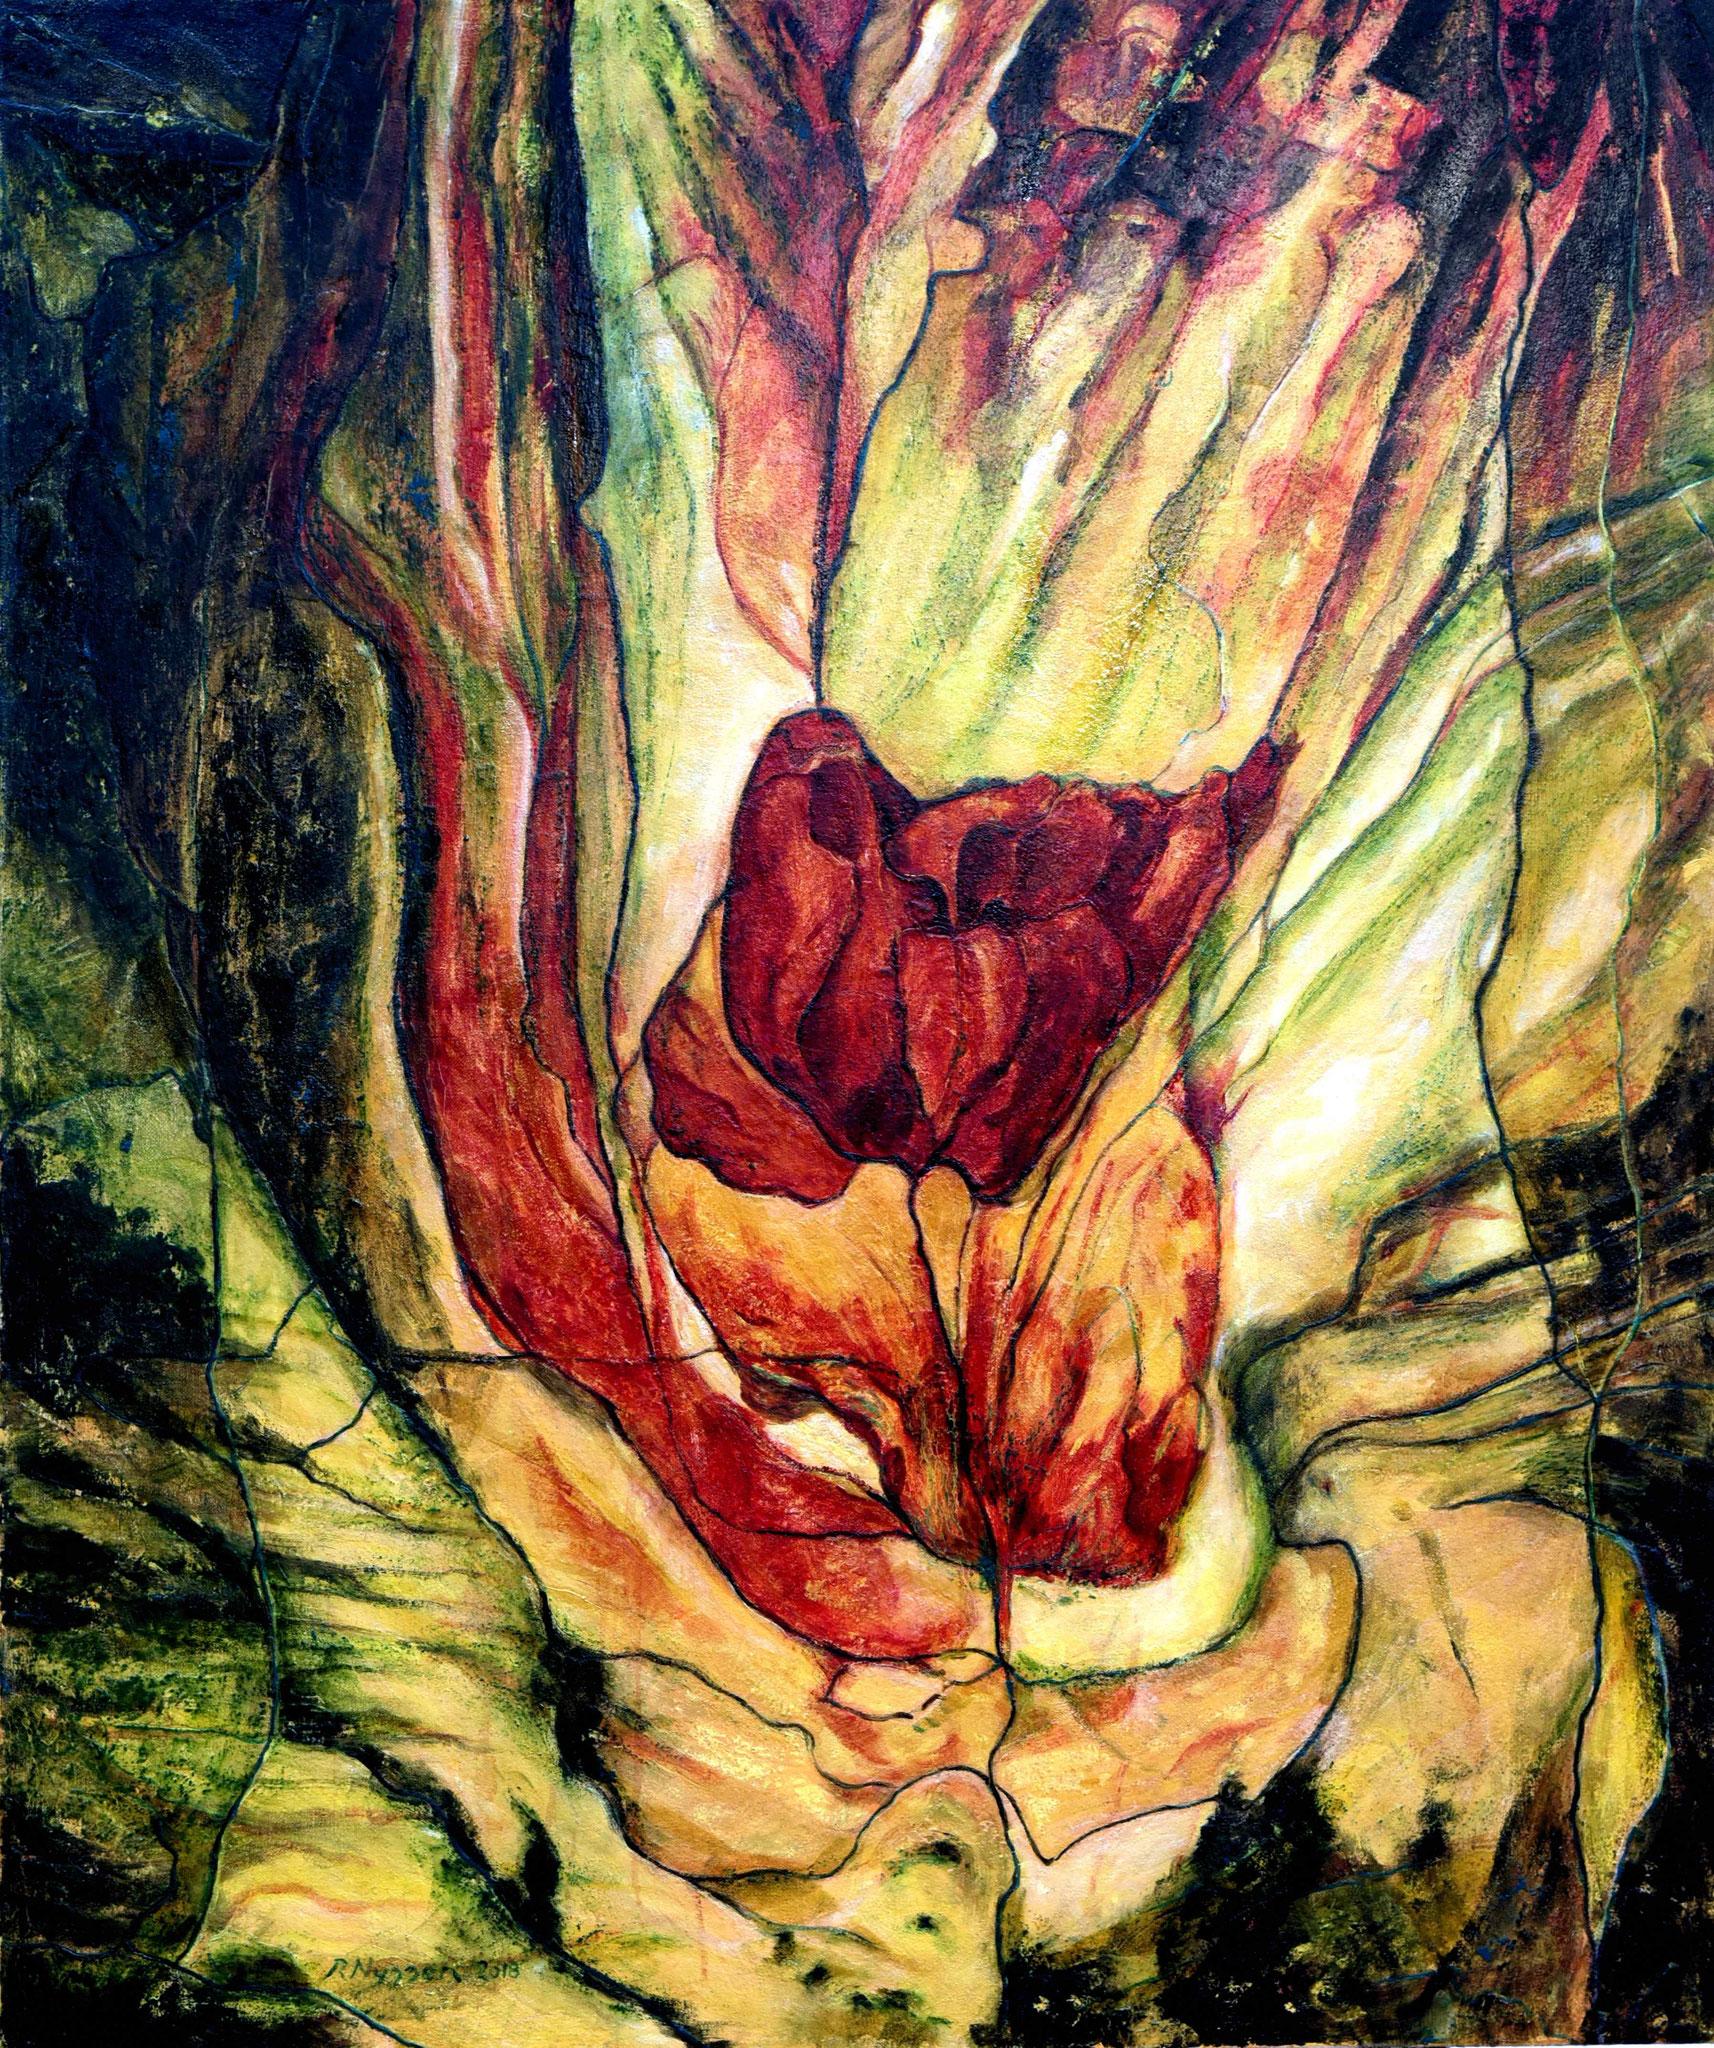 """Letzte Rose""-2018-Öl auf LW-120*100cm / Last rose- oil on canvas"